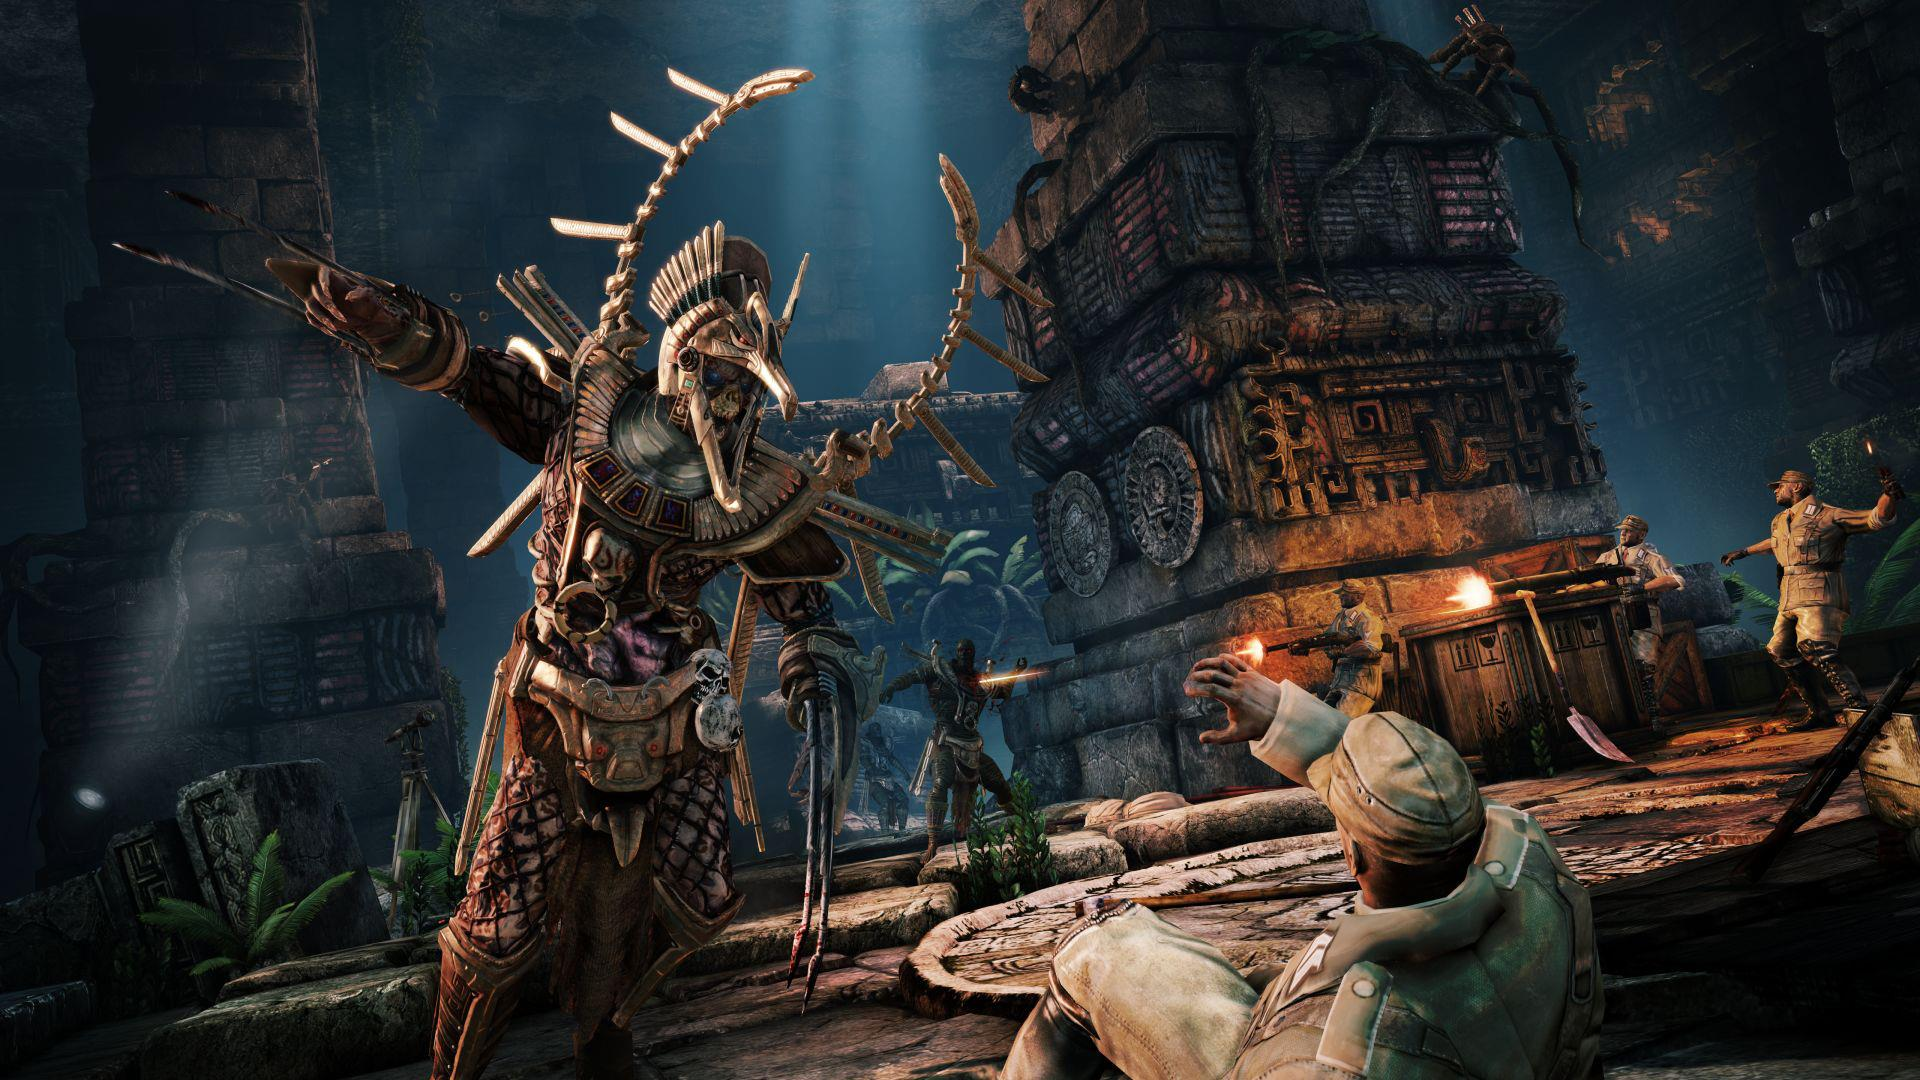 Клон Uncharted на движке Unreal Engine 3   Блог ЗОНА51